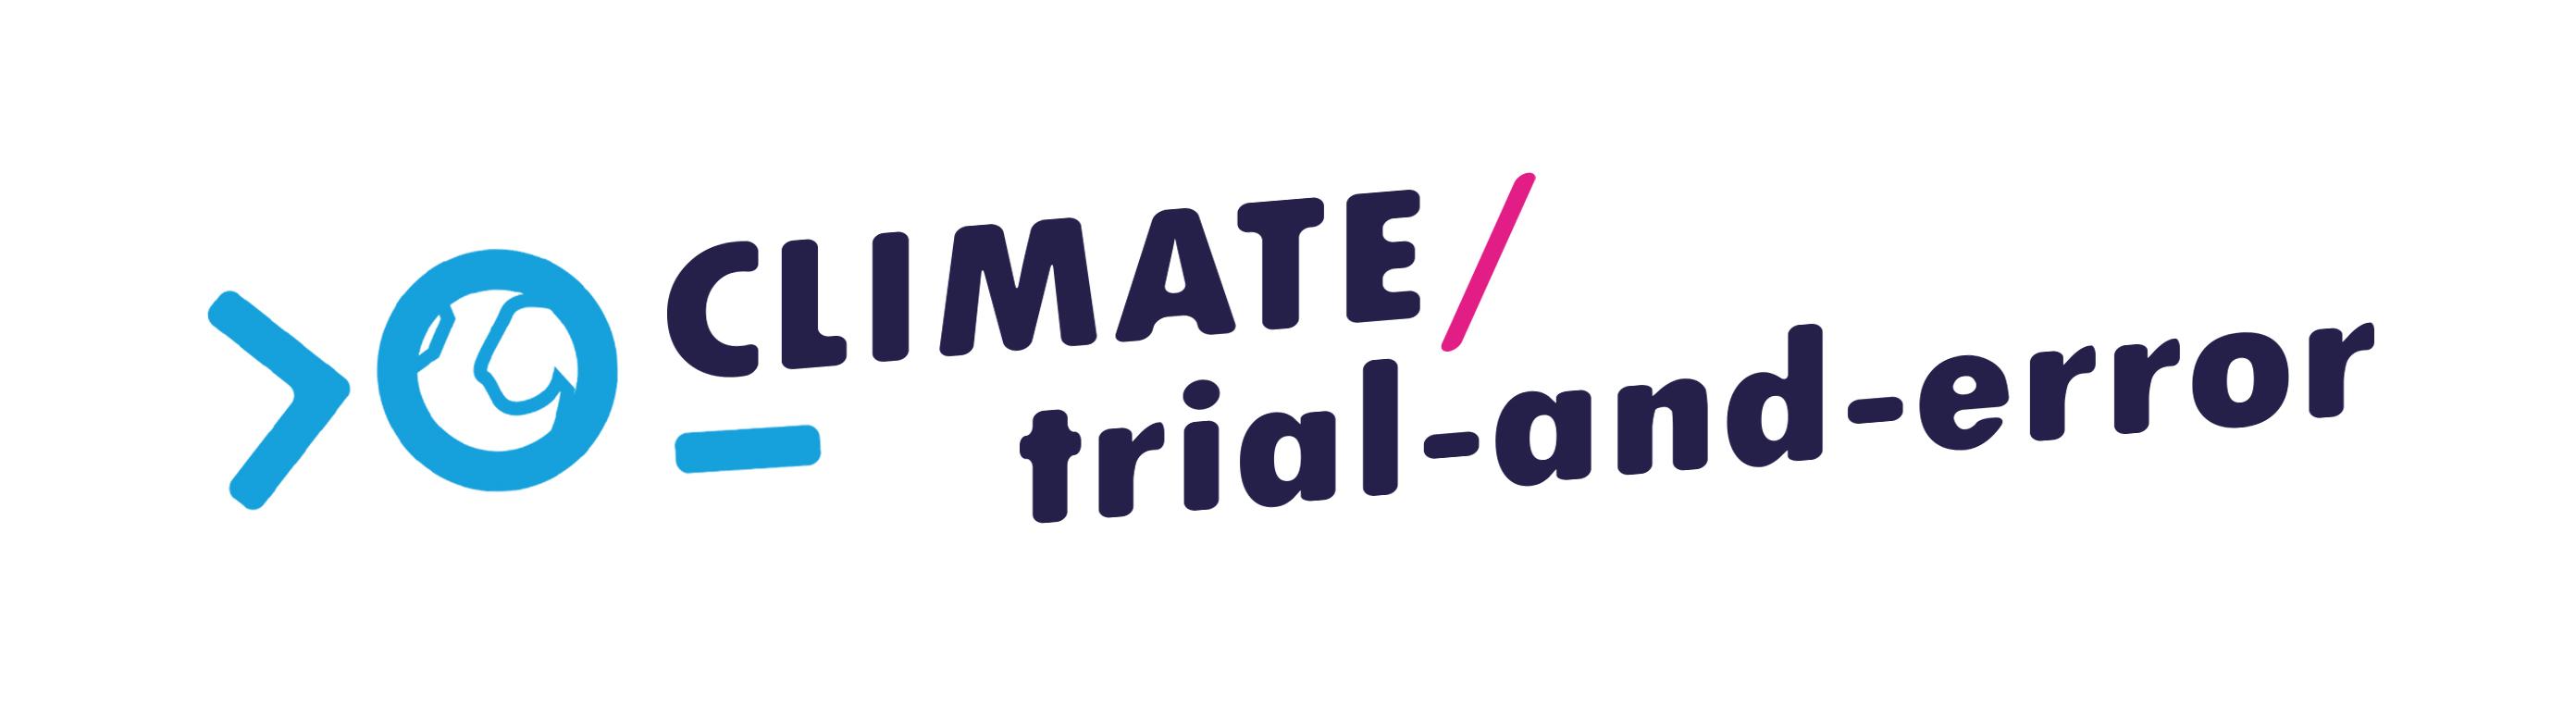 Climate Change Jam: Trial & Error